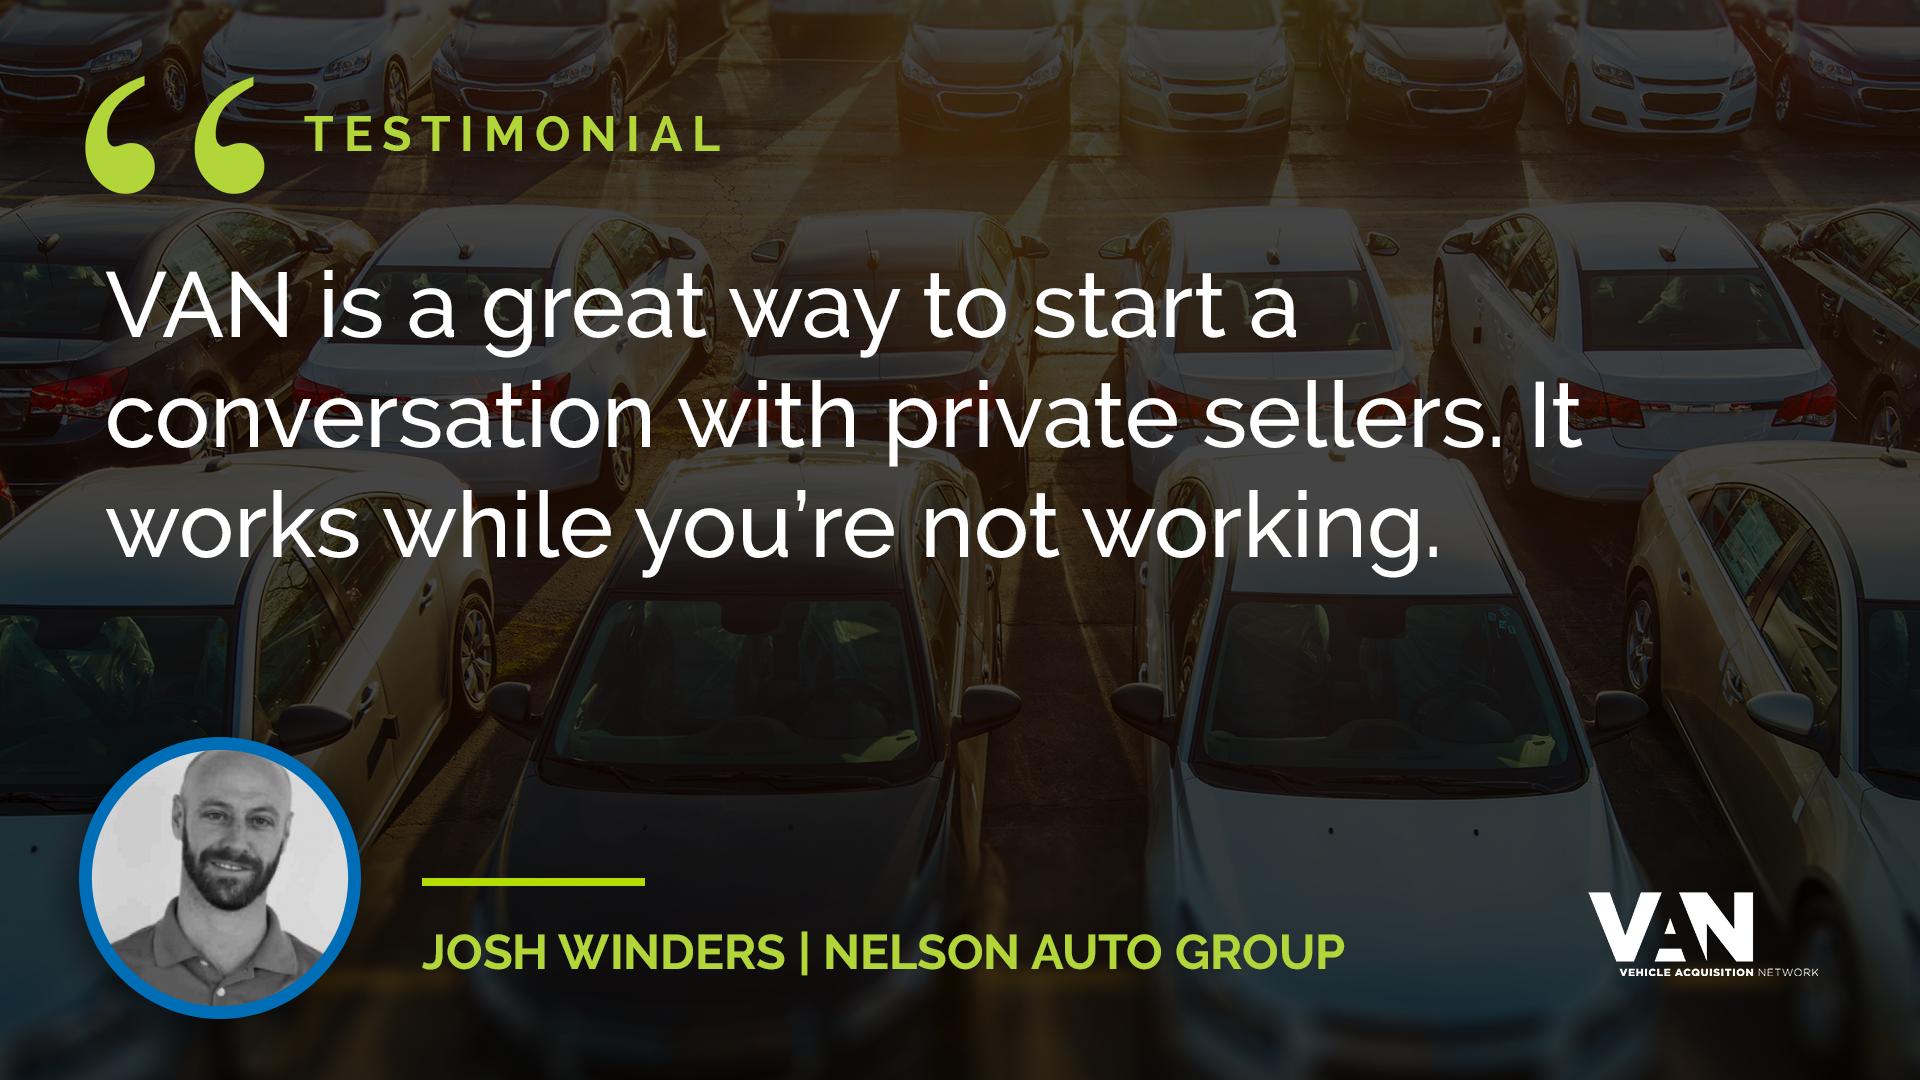 Josh Winder - Nelson Auto Group